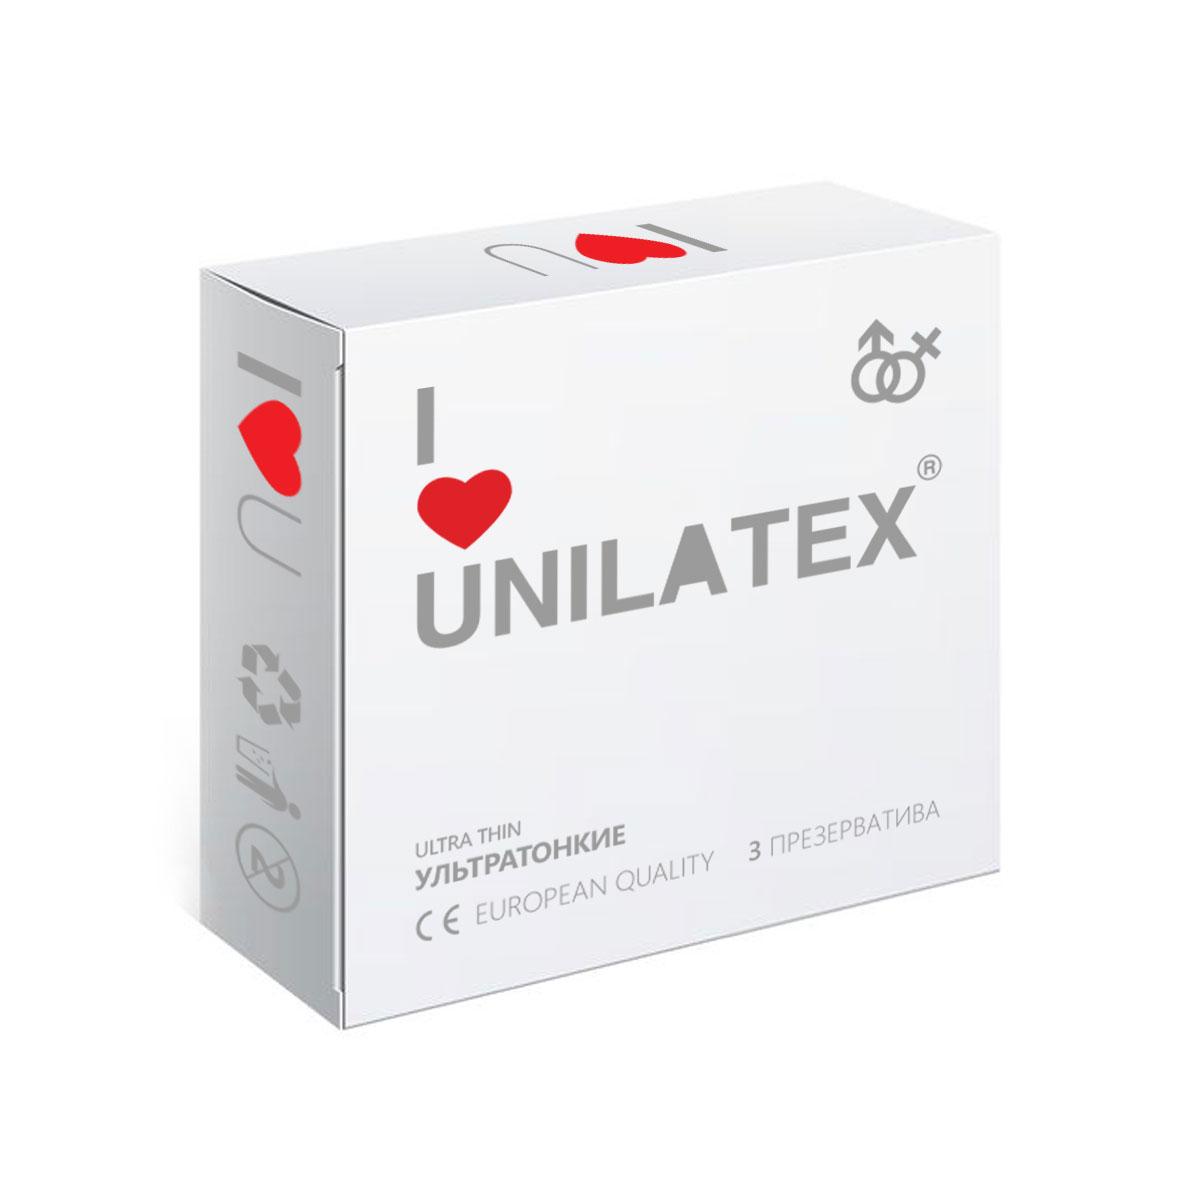 Презервативы Unilatex UltraThin, 3 шт ( Ref. 3012 )